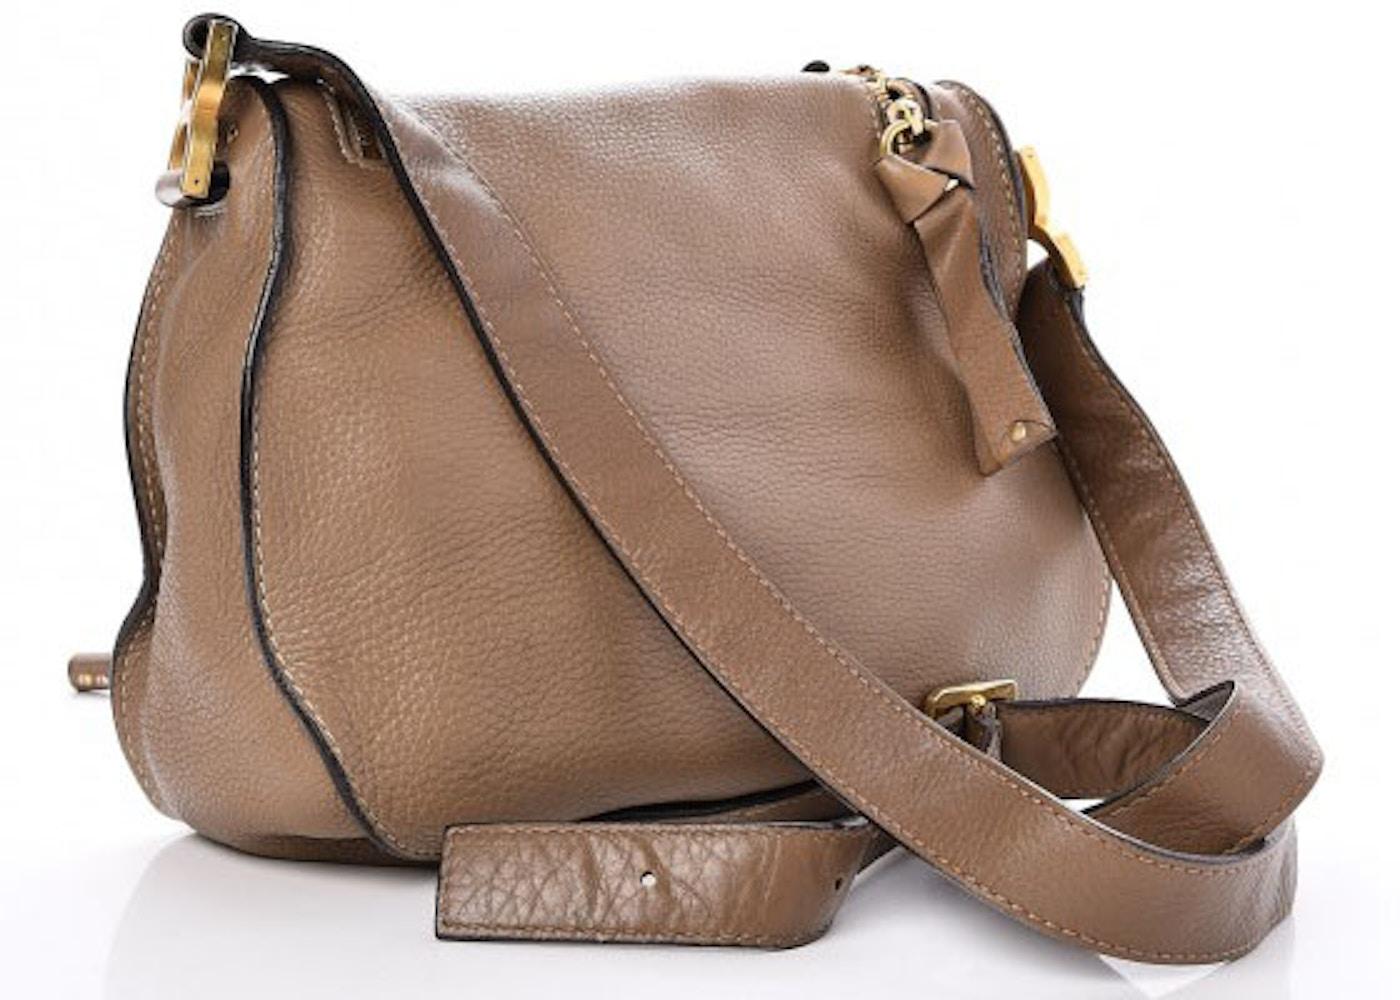 f2409c5c Buy & Sell Chloe Handbags - New Highest Bids